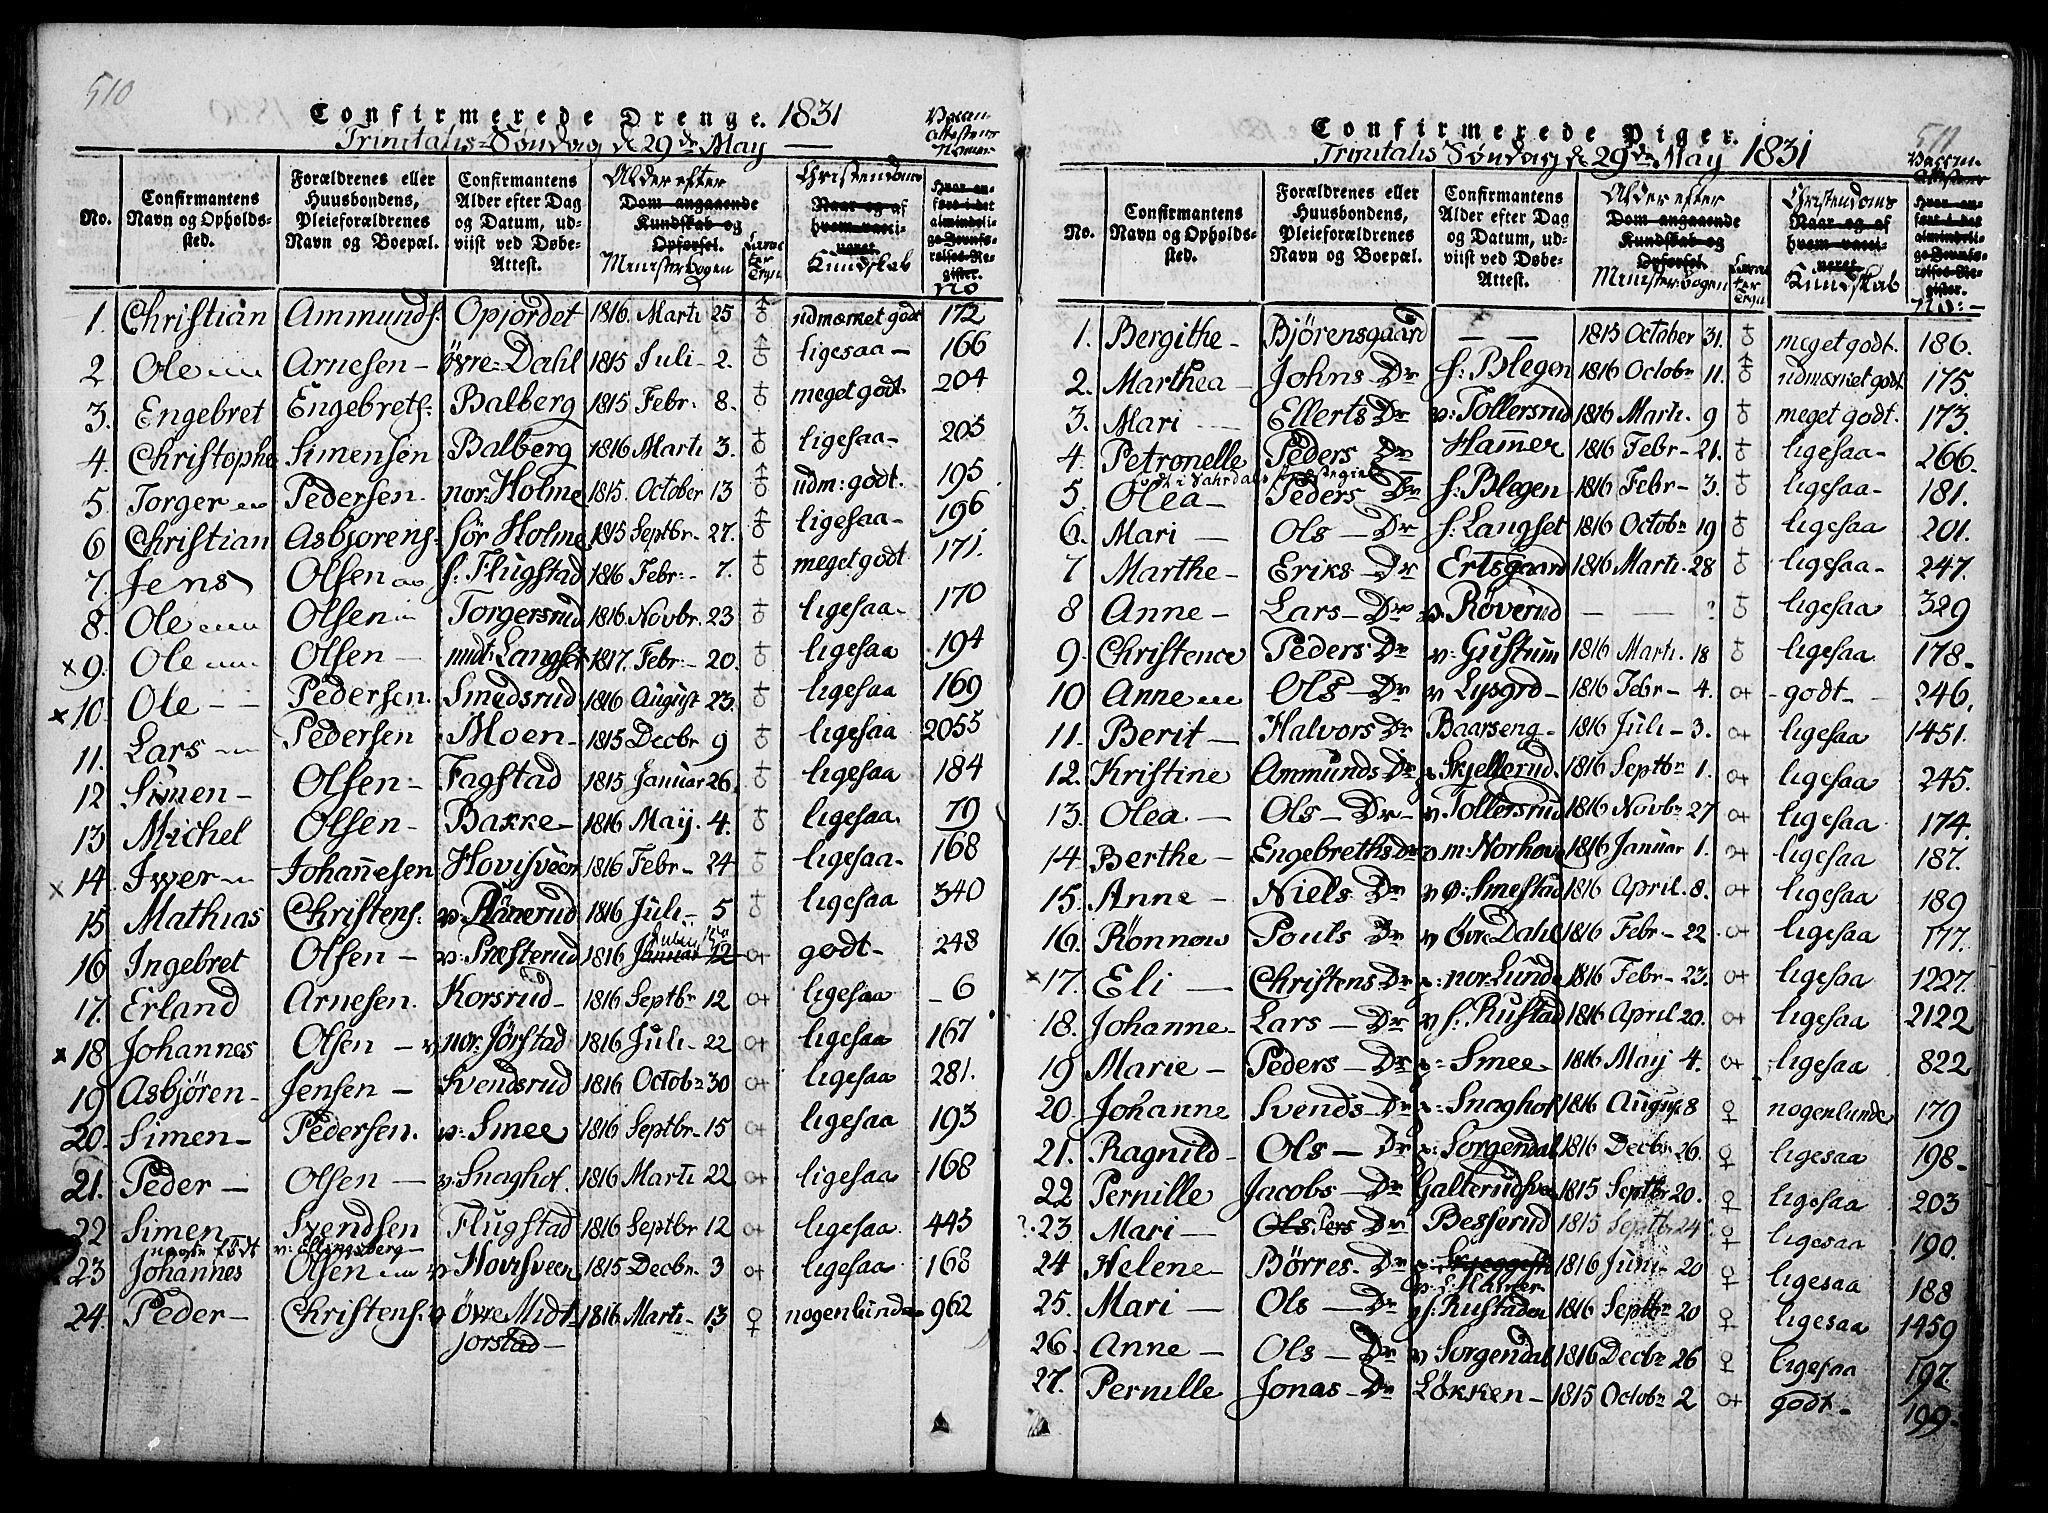 SAH, Fåberg prestekontor, Ministerialbok nr. 3, 1818-1833, s. 510-511